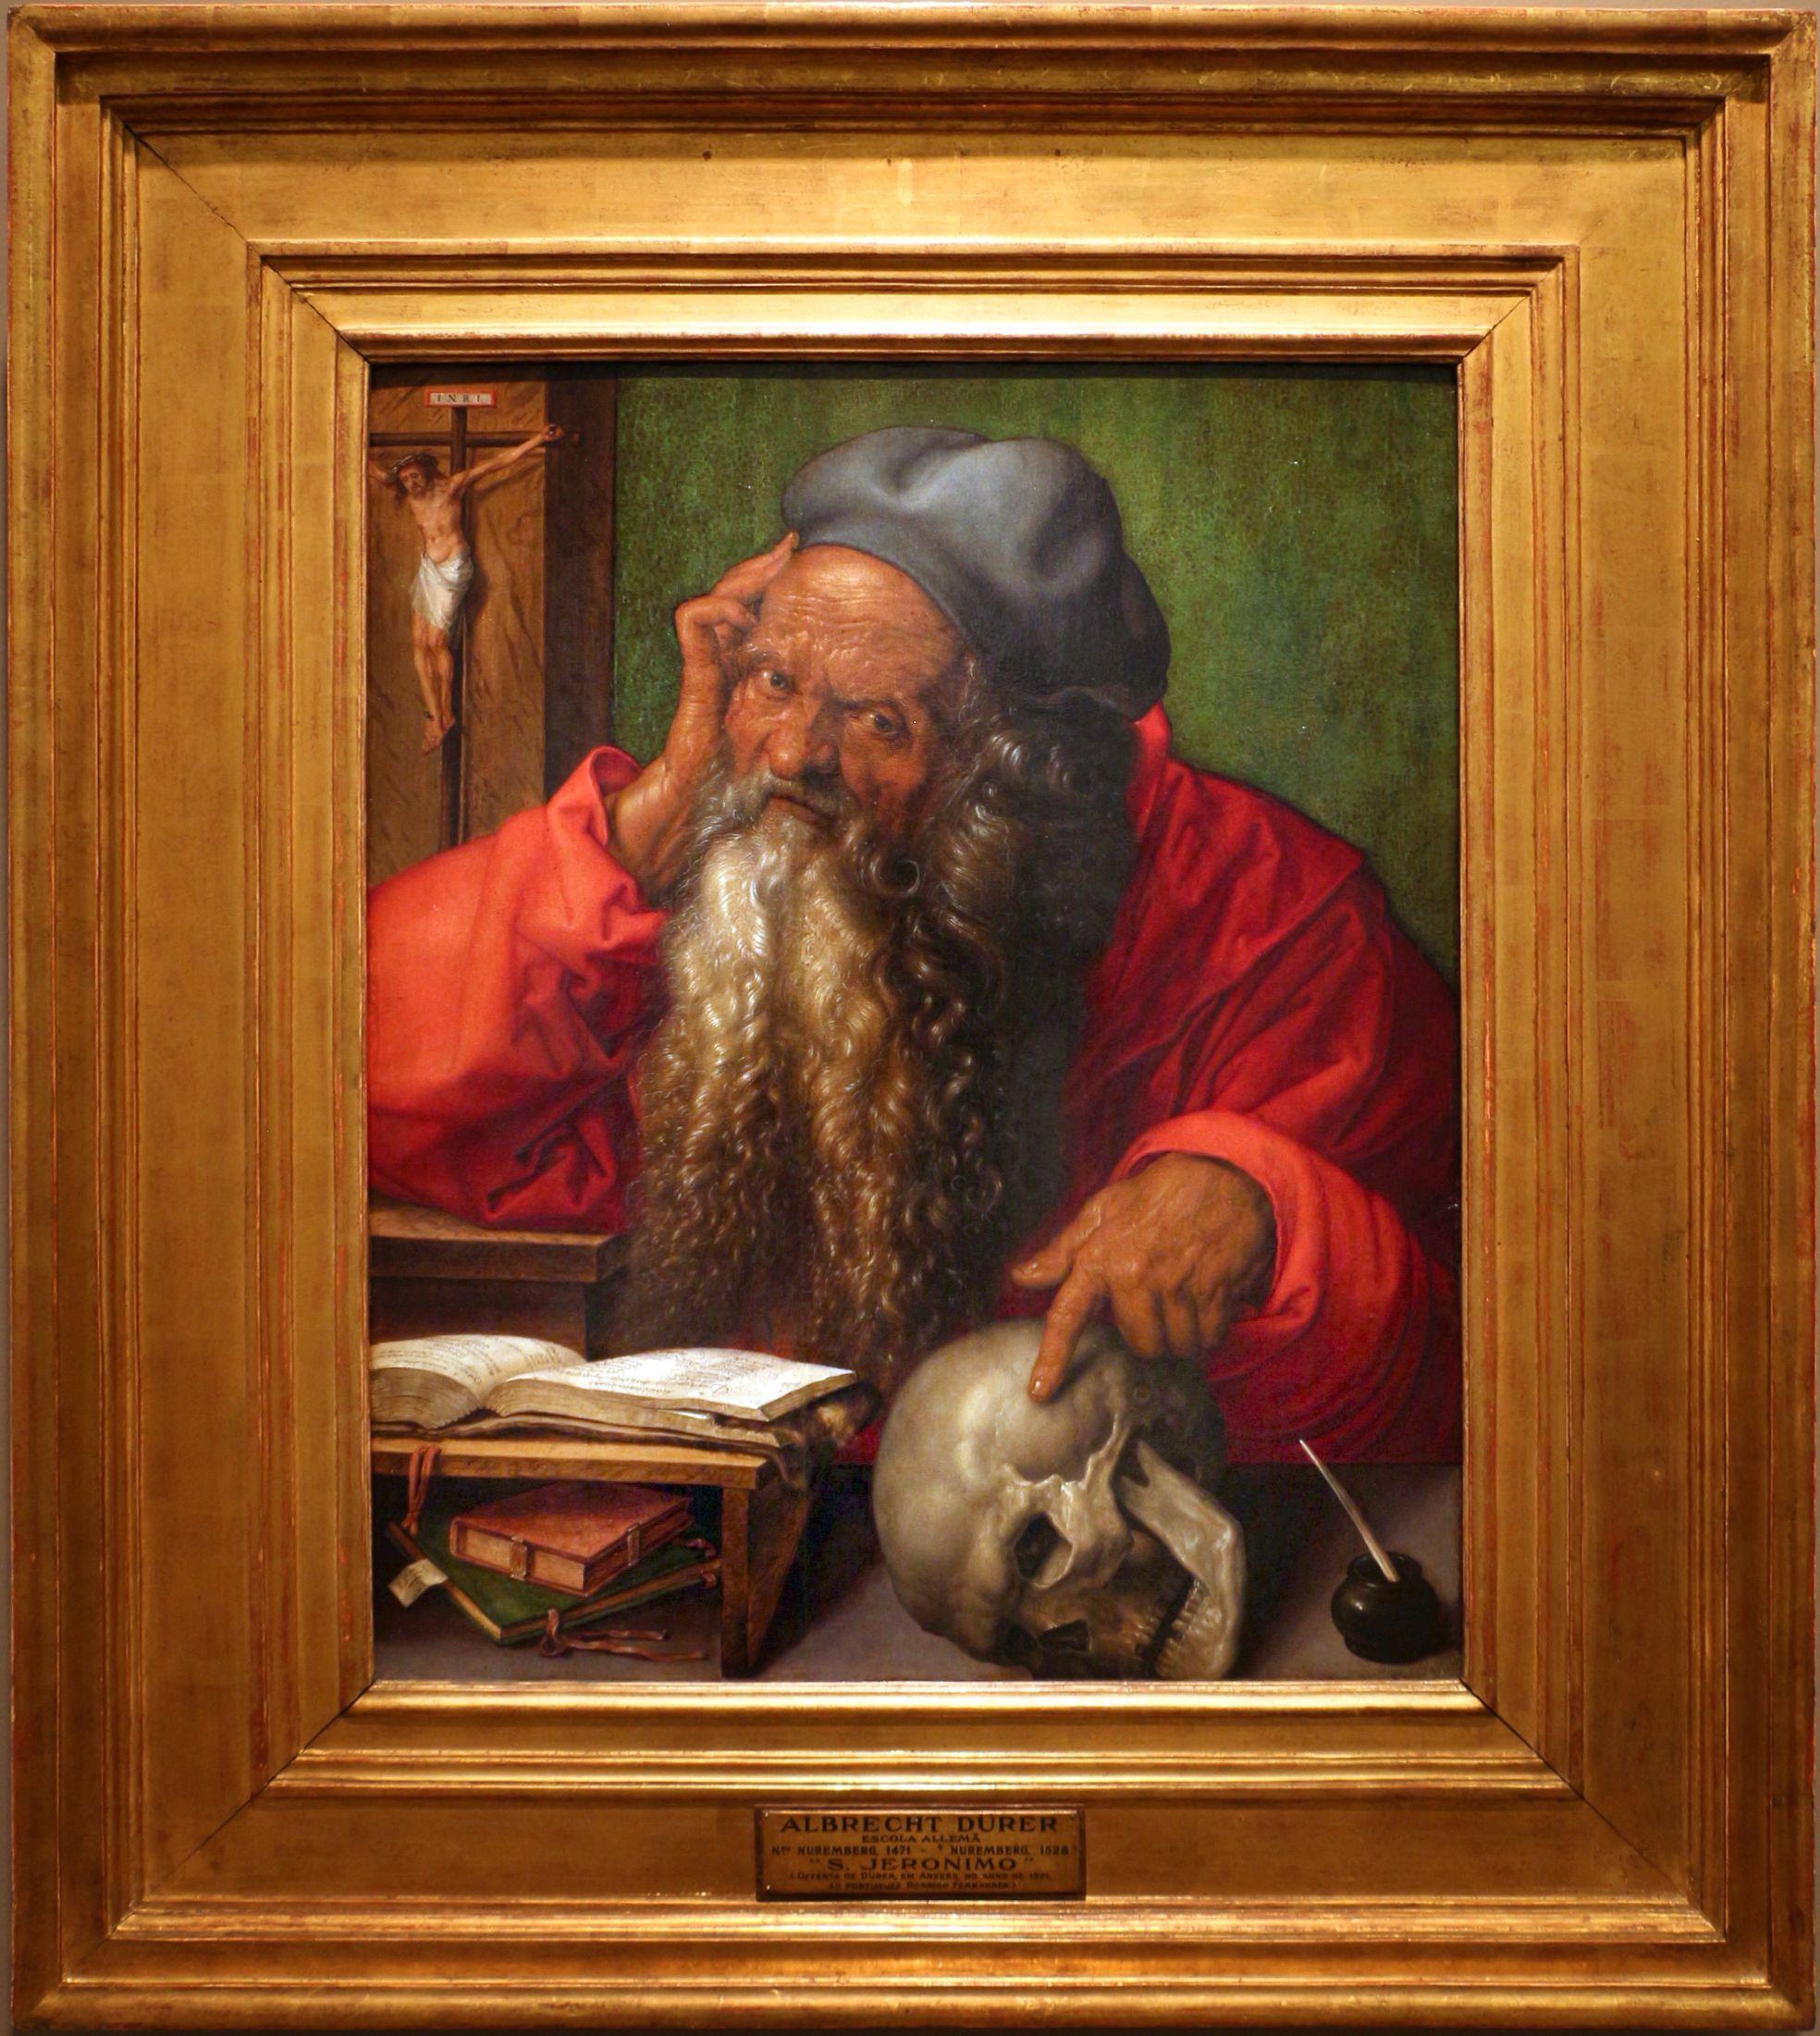 File:Albrecht dürer, san girolamo nello studio, 1521, 01.jpg